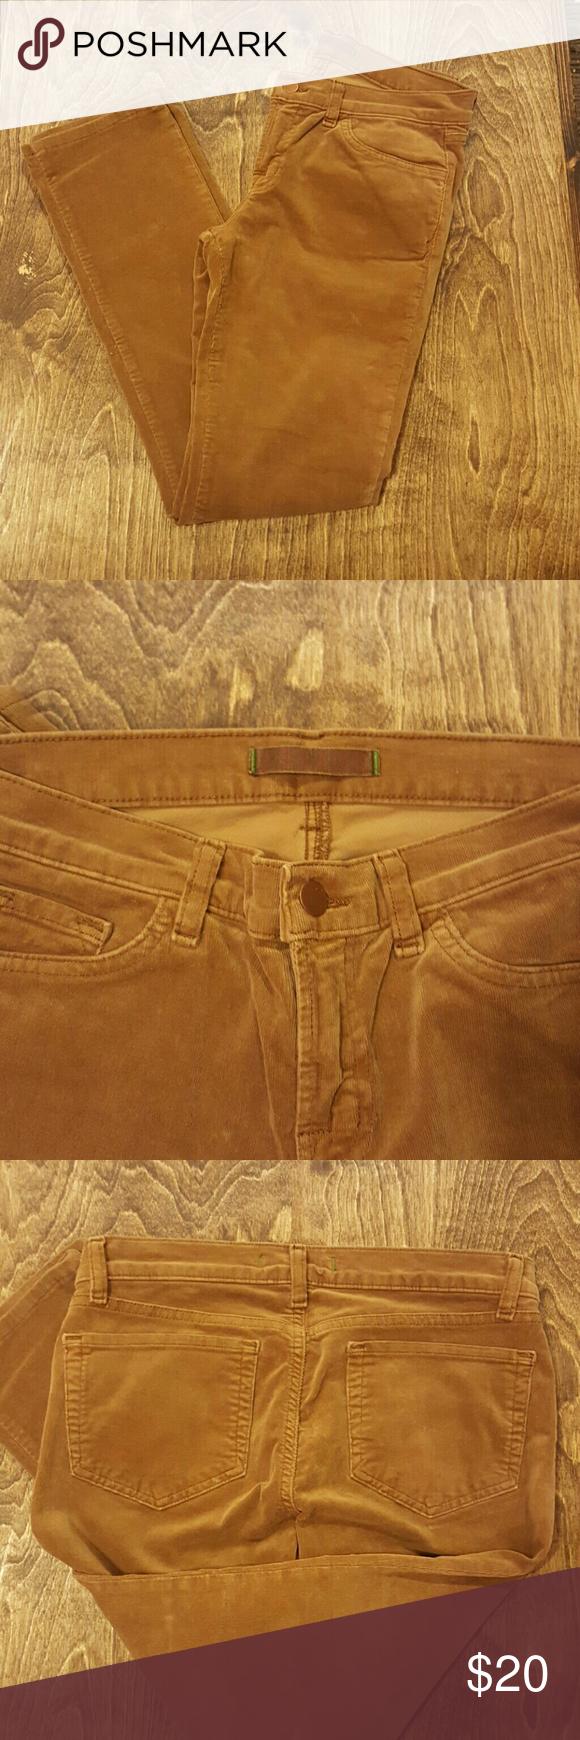 J brand velour  pencil pants Color caramel size 28 ask questions before purchasing no returns j brand  Jeans